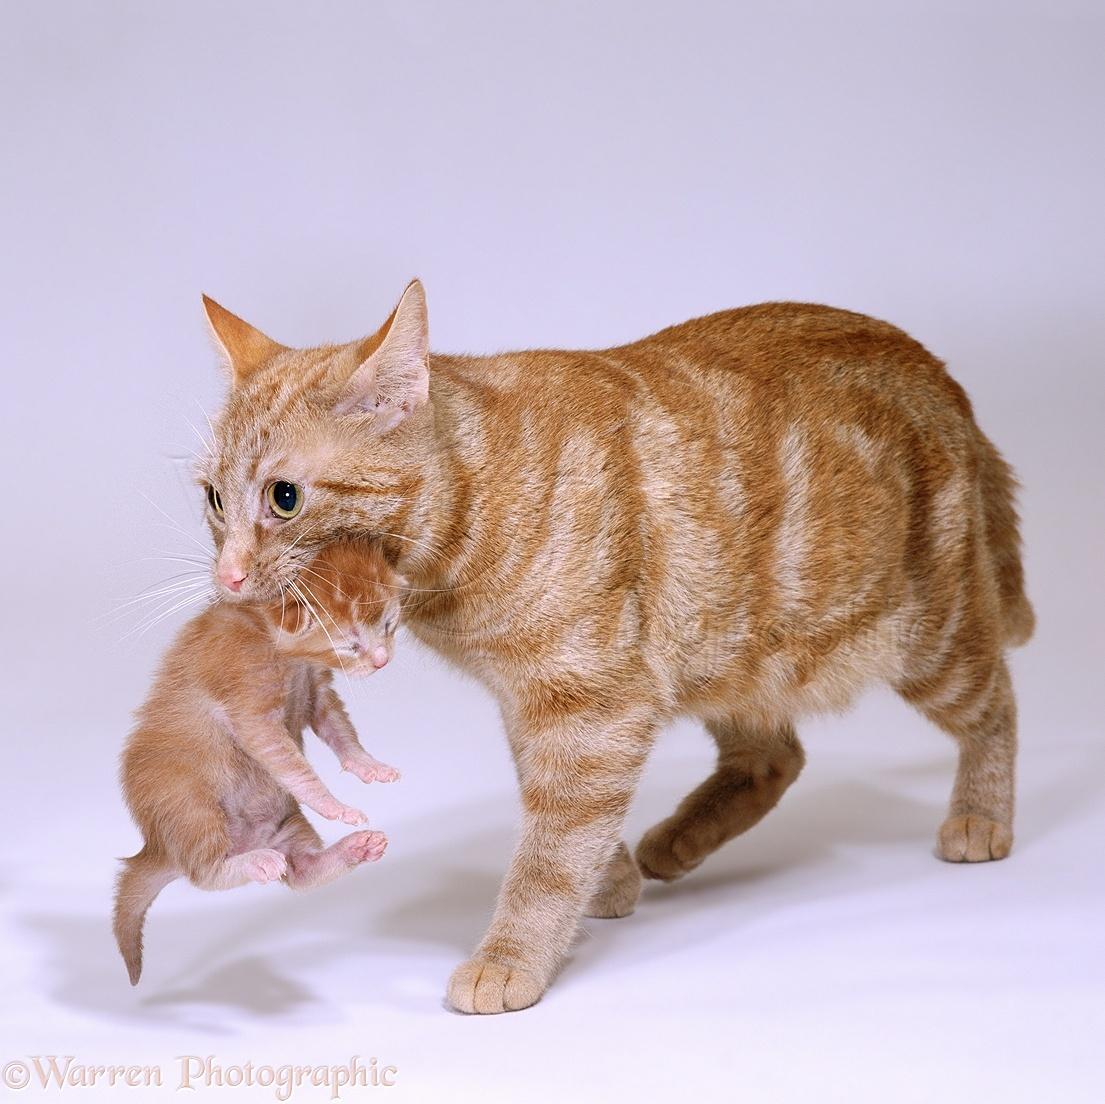 Cat Carrying New Kitten